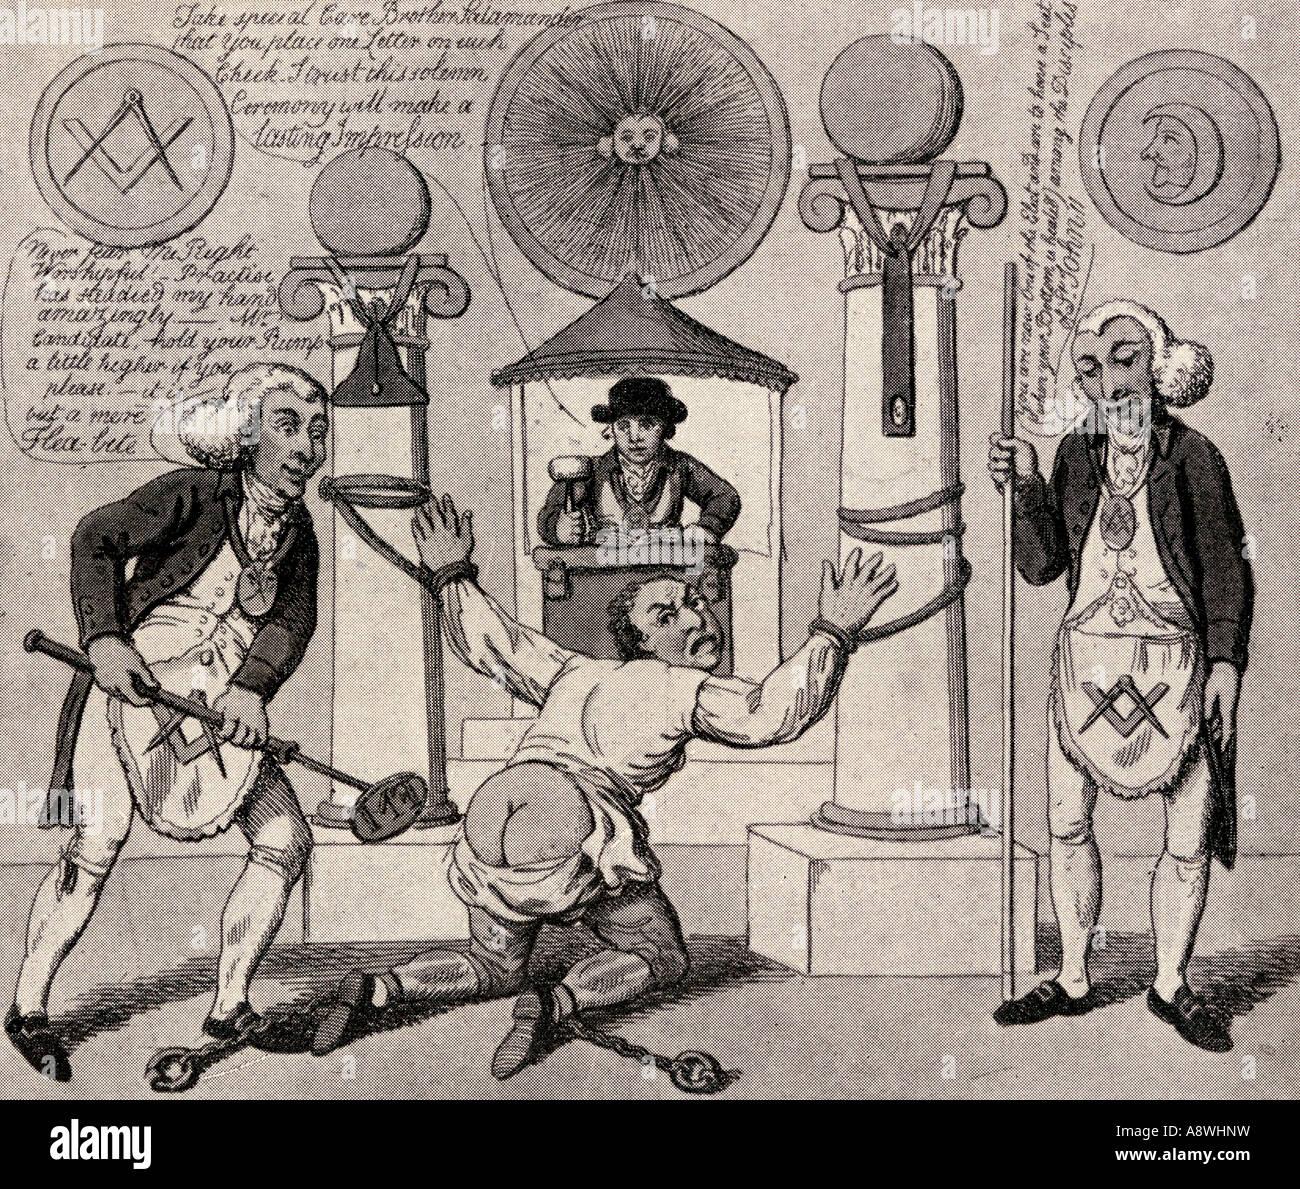 How to make a Mason English antimasonic caricature from 1800 - Stock Image